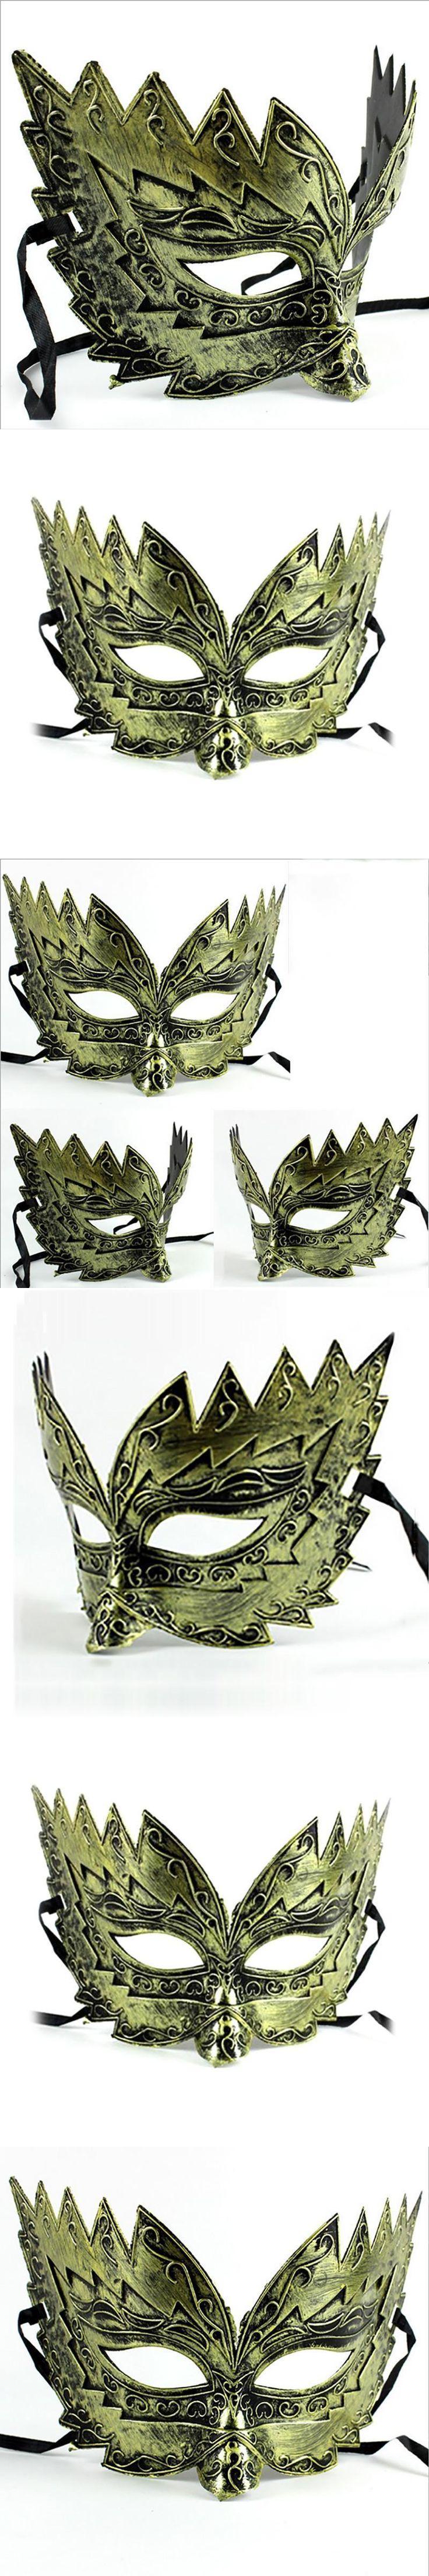 1pcs Halloween make-up dance mask Hip-hop painted mask Party retro half face mask A20